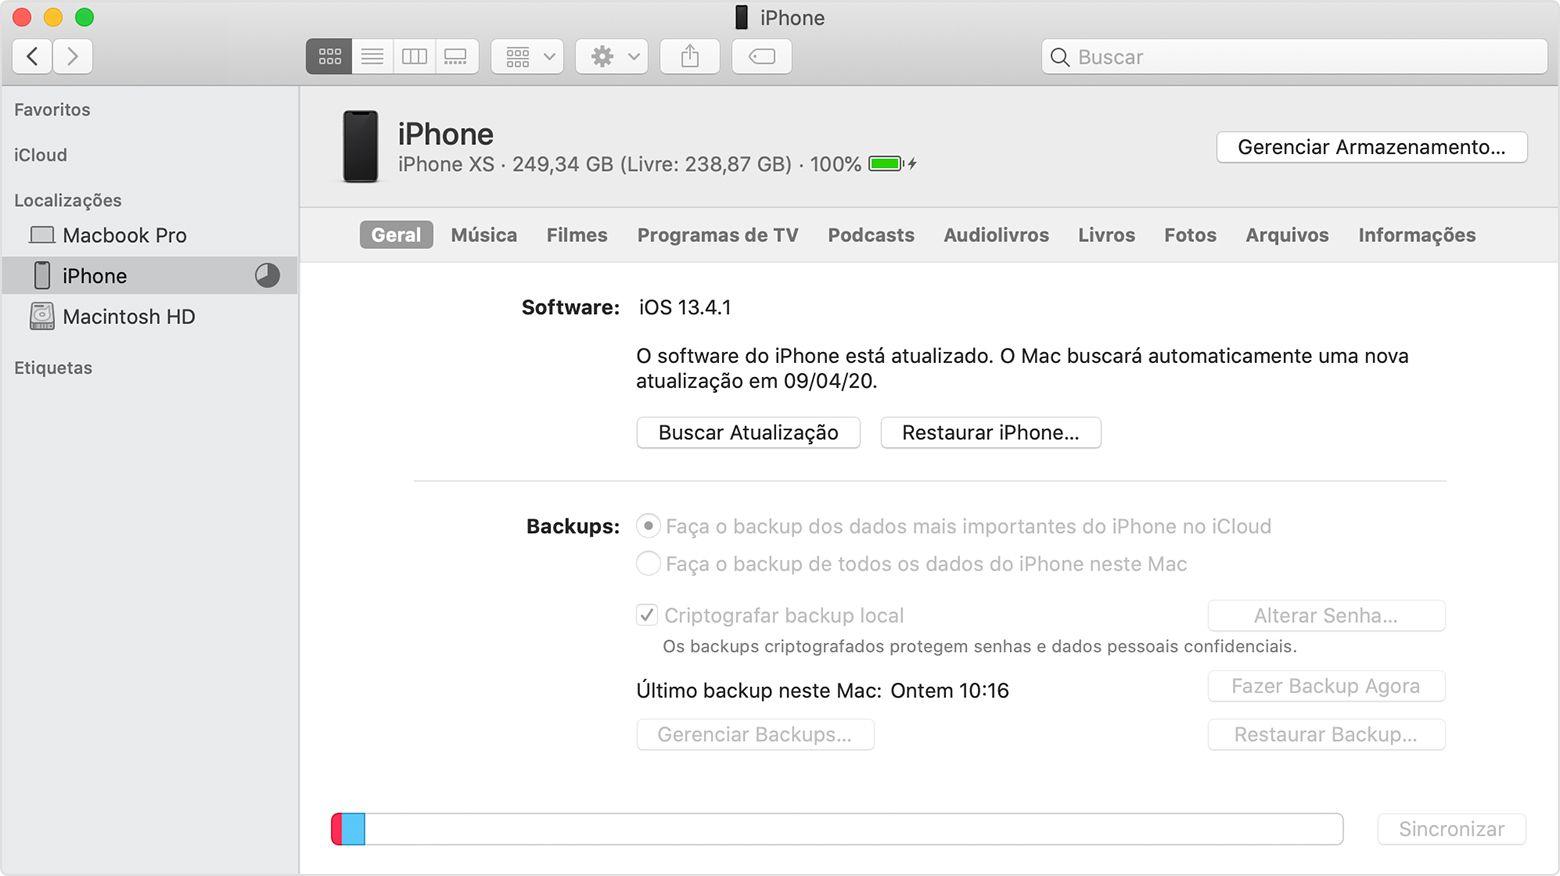 macos-catalina-finder-device-running-back-up.jpeg